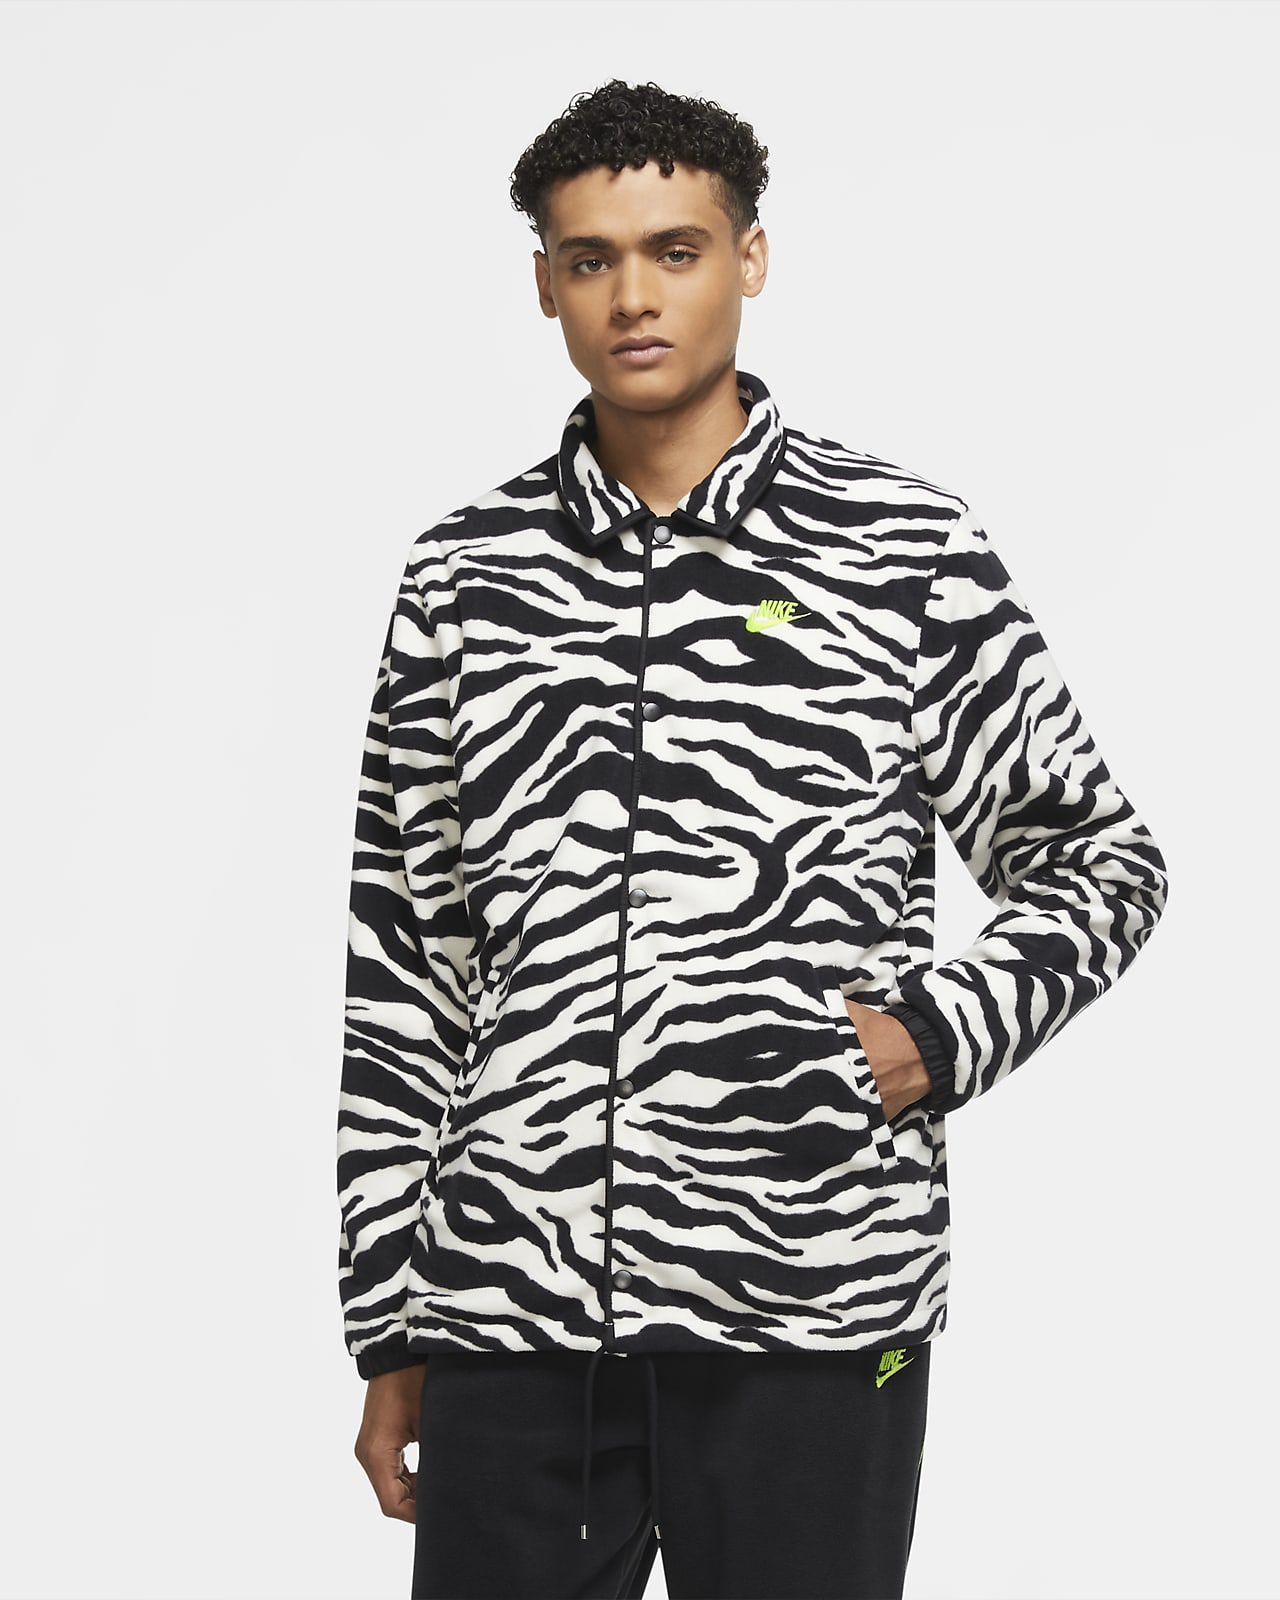 Nike Sportswear City Edition Coaches-Jacke für Herren's Coaches Jacket